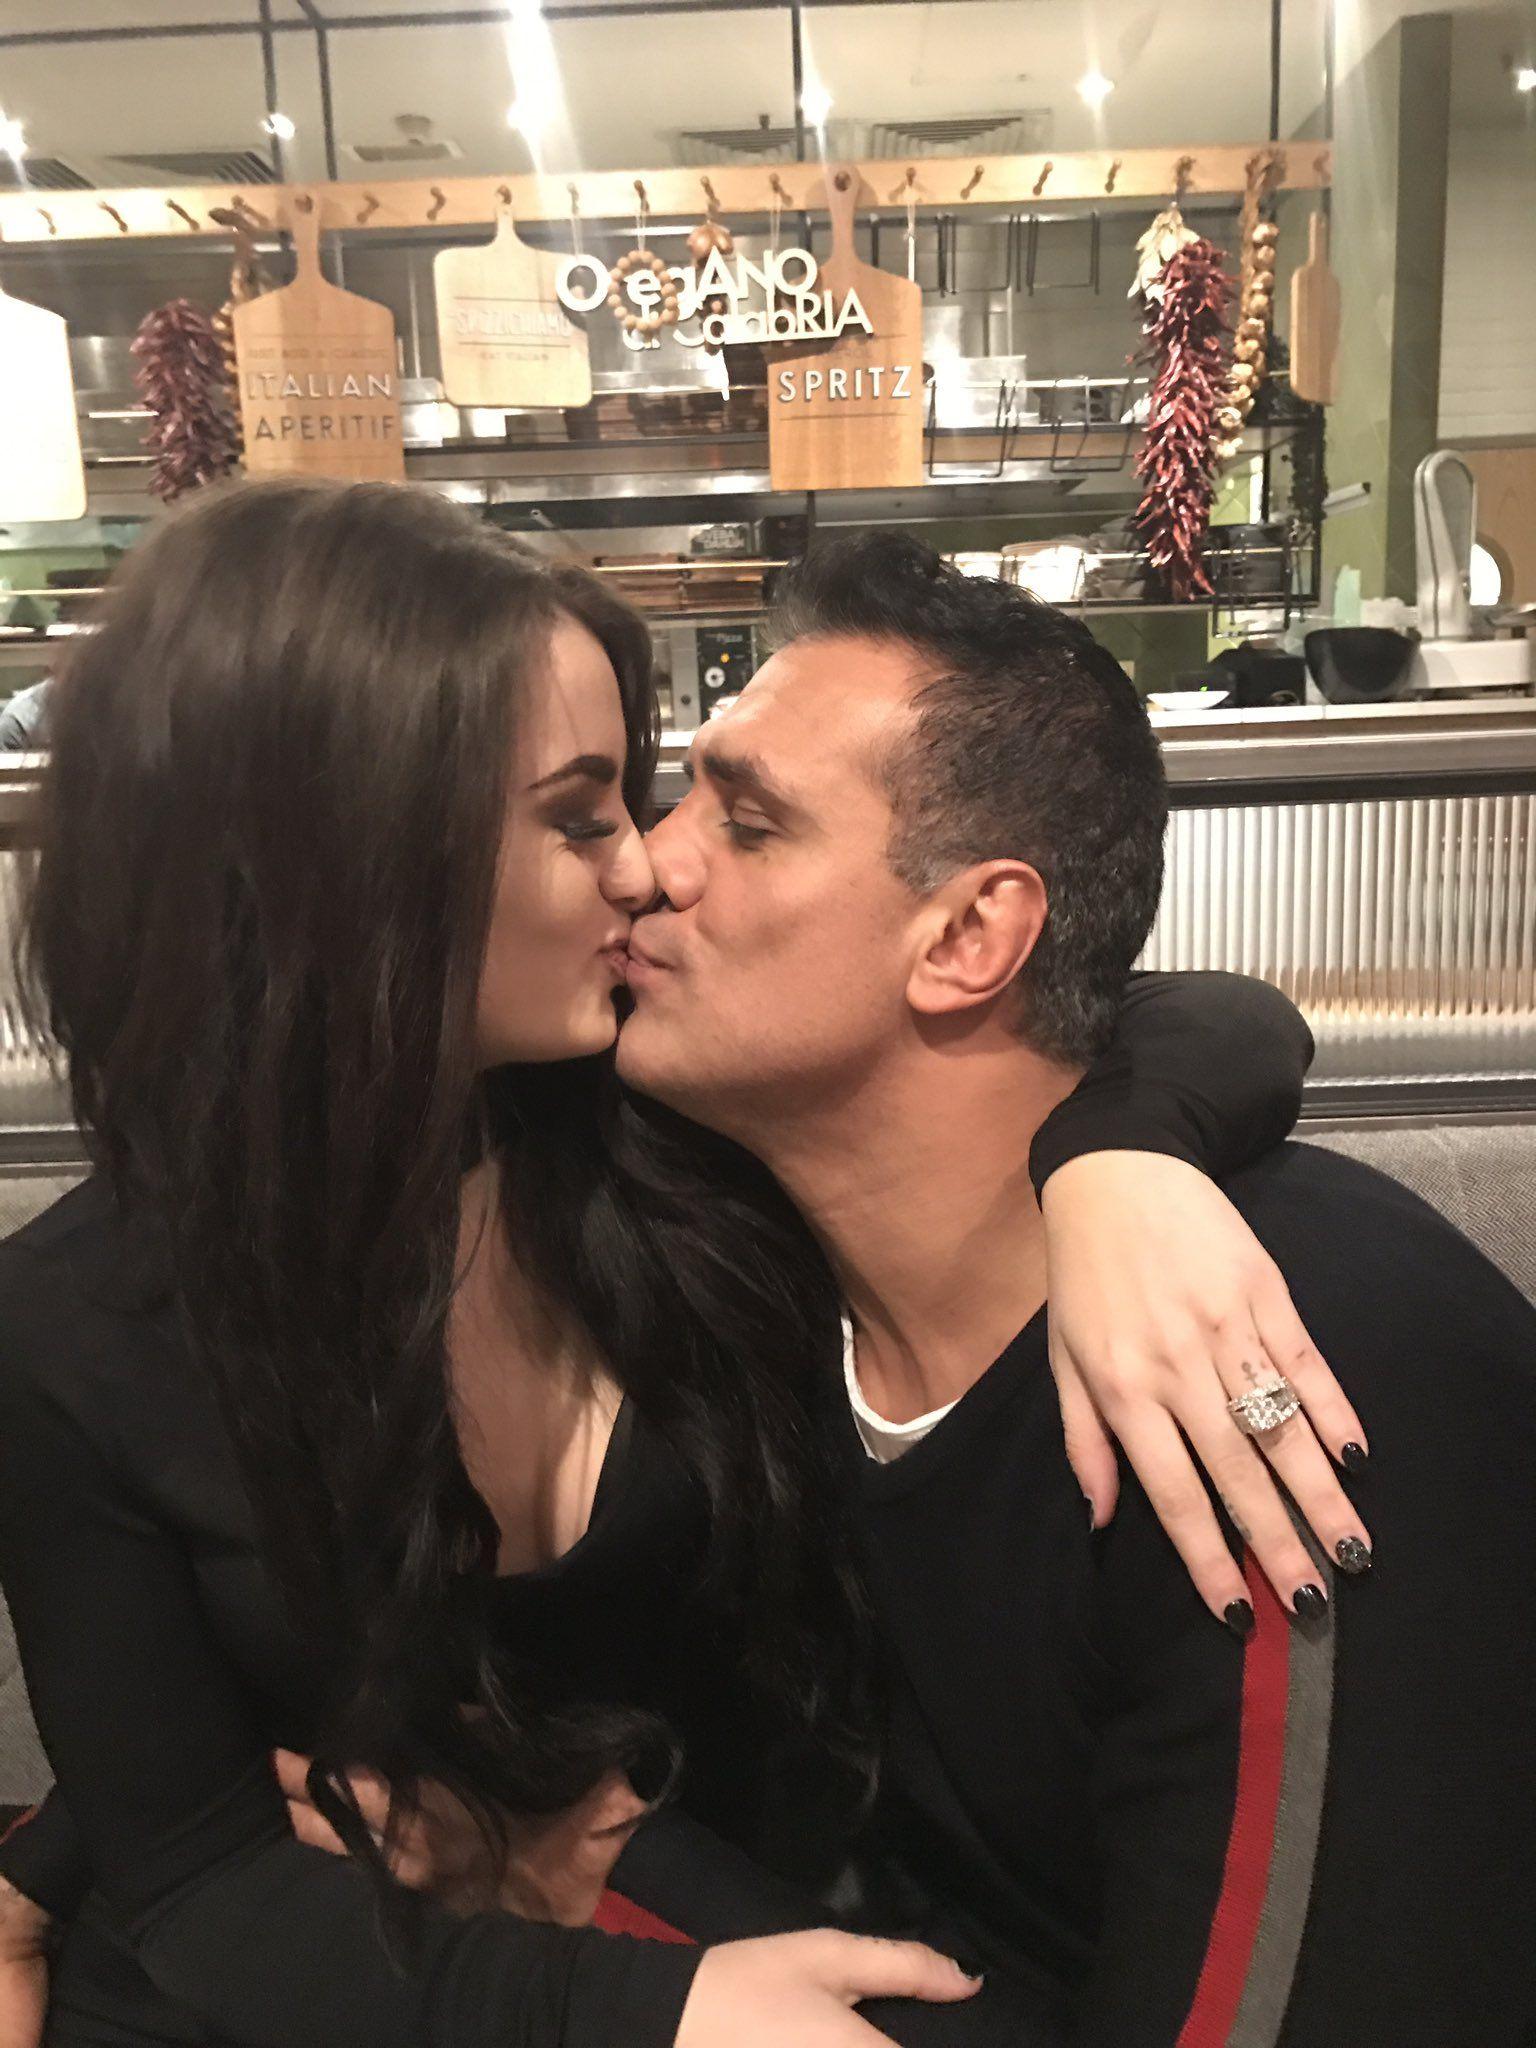 Paige dating Bray Wyatt paras naimisissa dating sites Australiassa